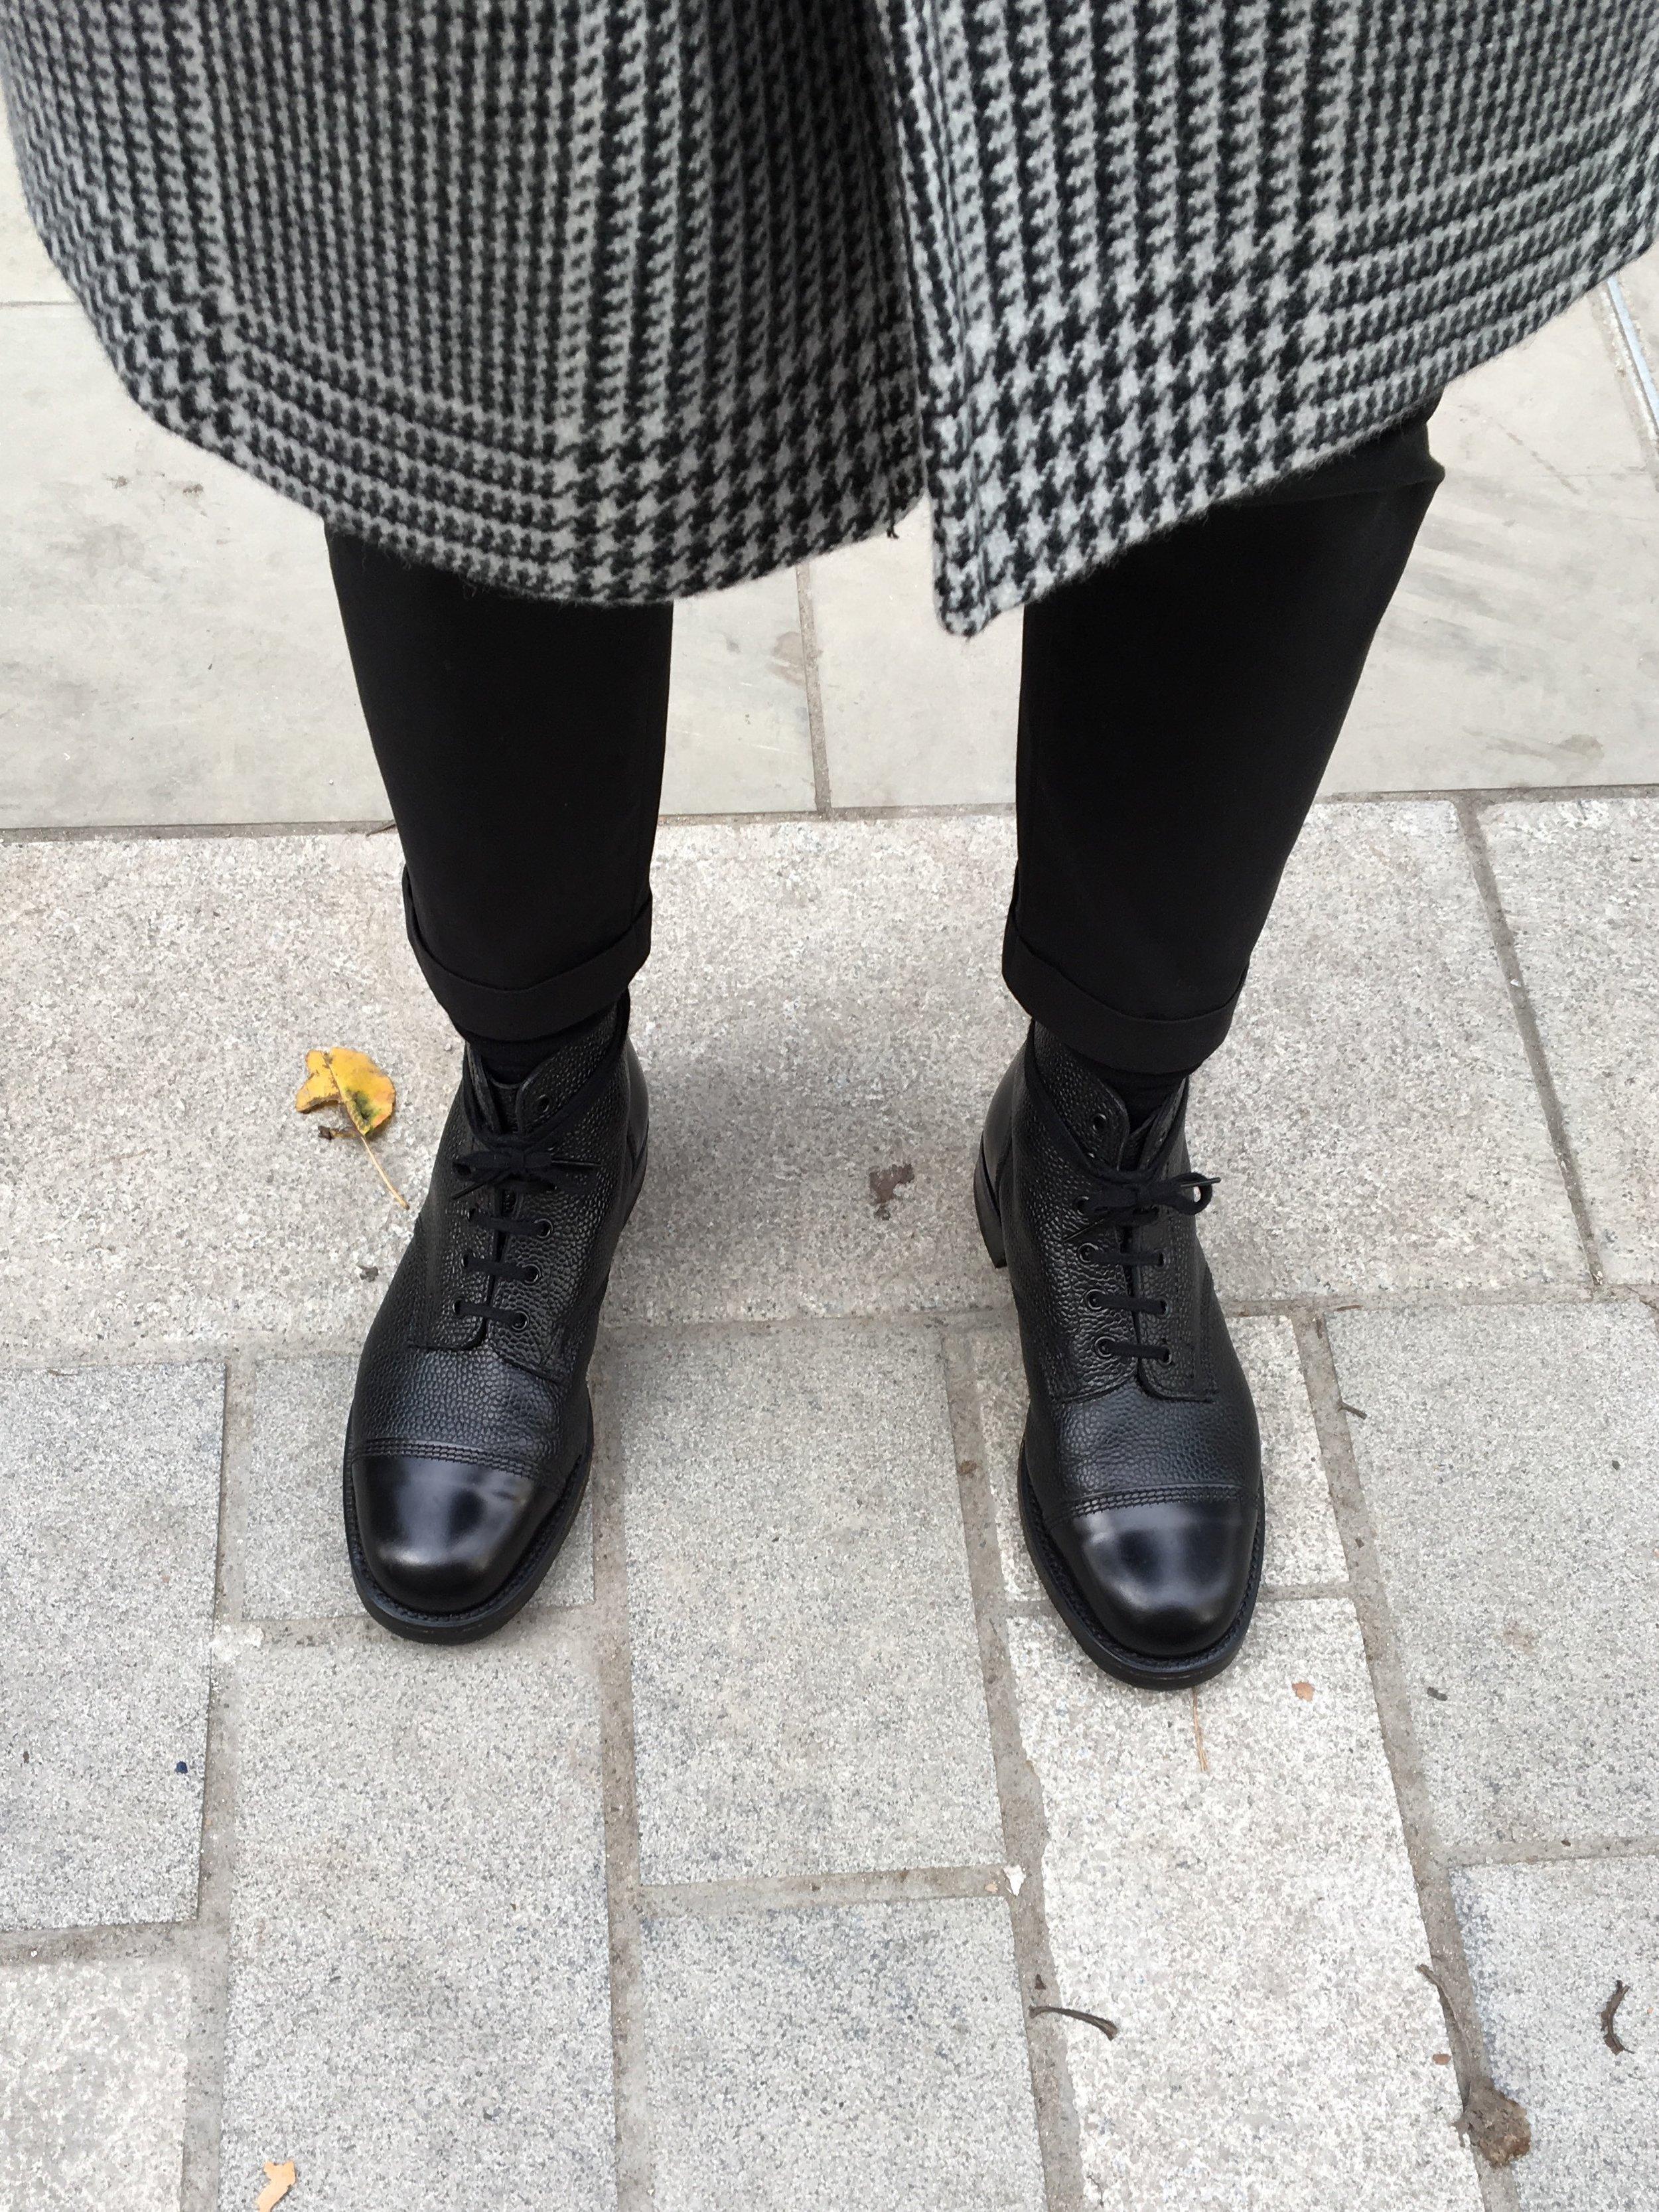 Casual snob - Sanders Officer Boots.jpg